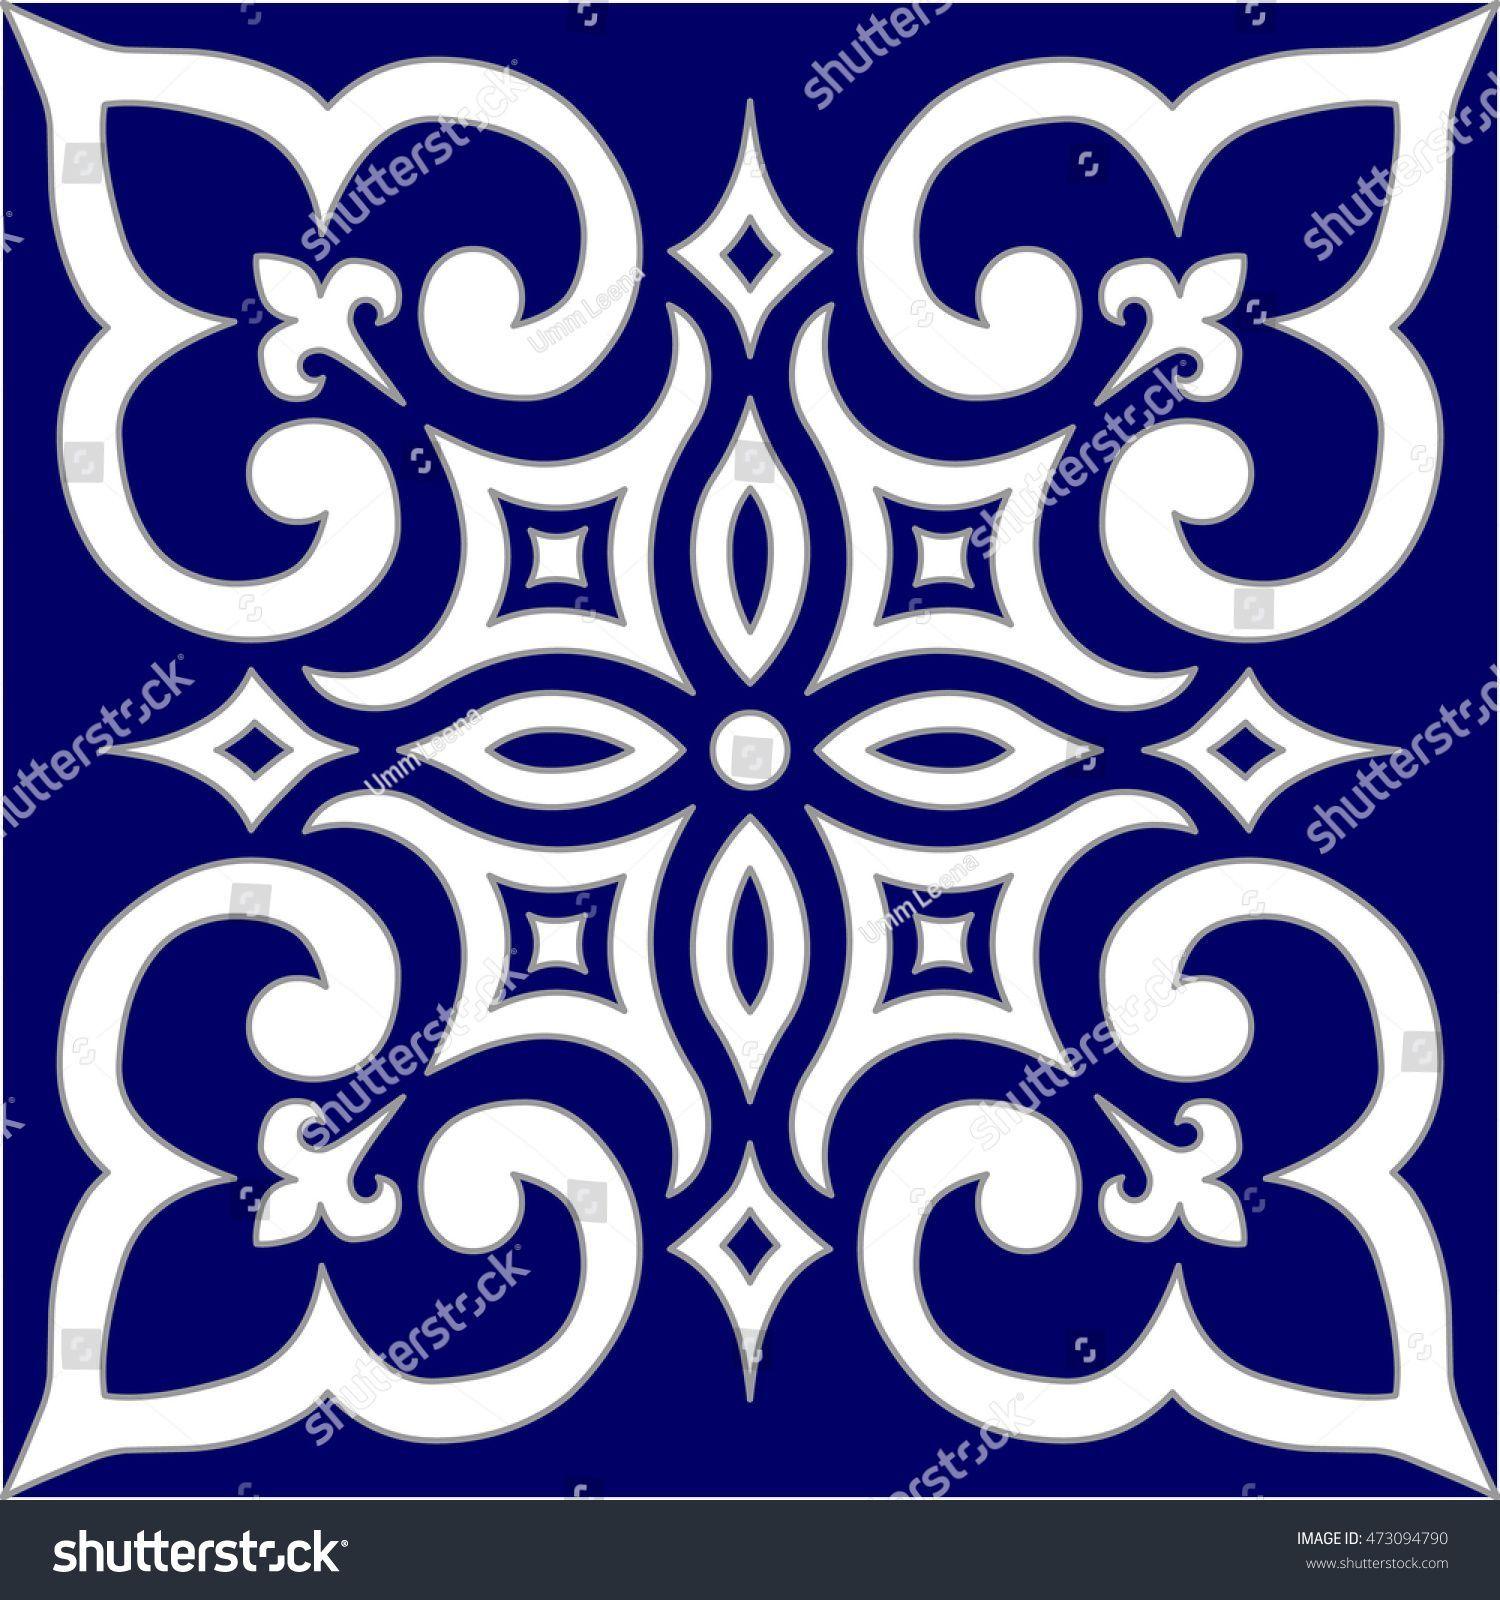 Patron Geometrico Islamico Arabesque Azul Blanco Stok Vektor Telifsiz 473094790 Dubai Arabesque Azul Blanco Dubai 2020 Arap Deseni Sanat Desen Stensiller